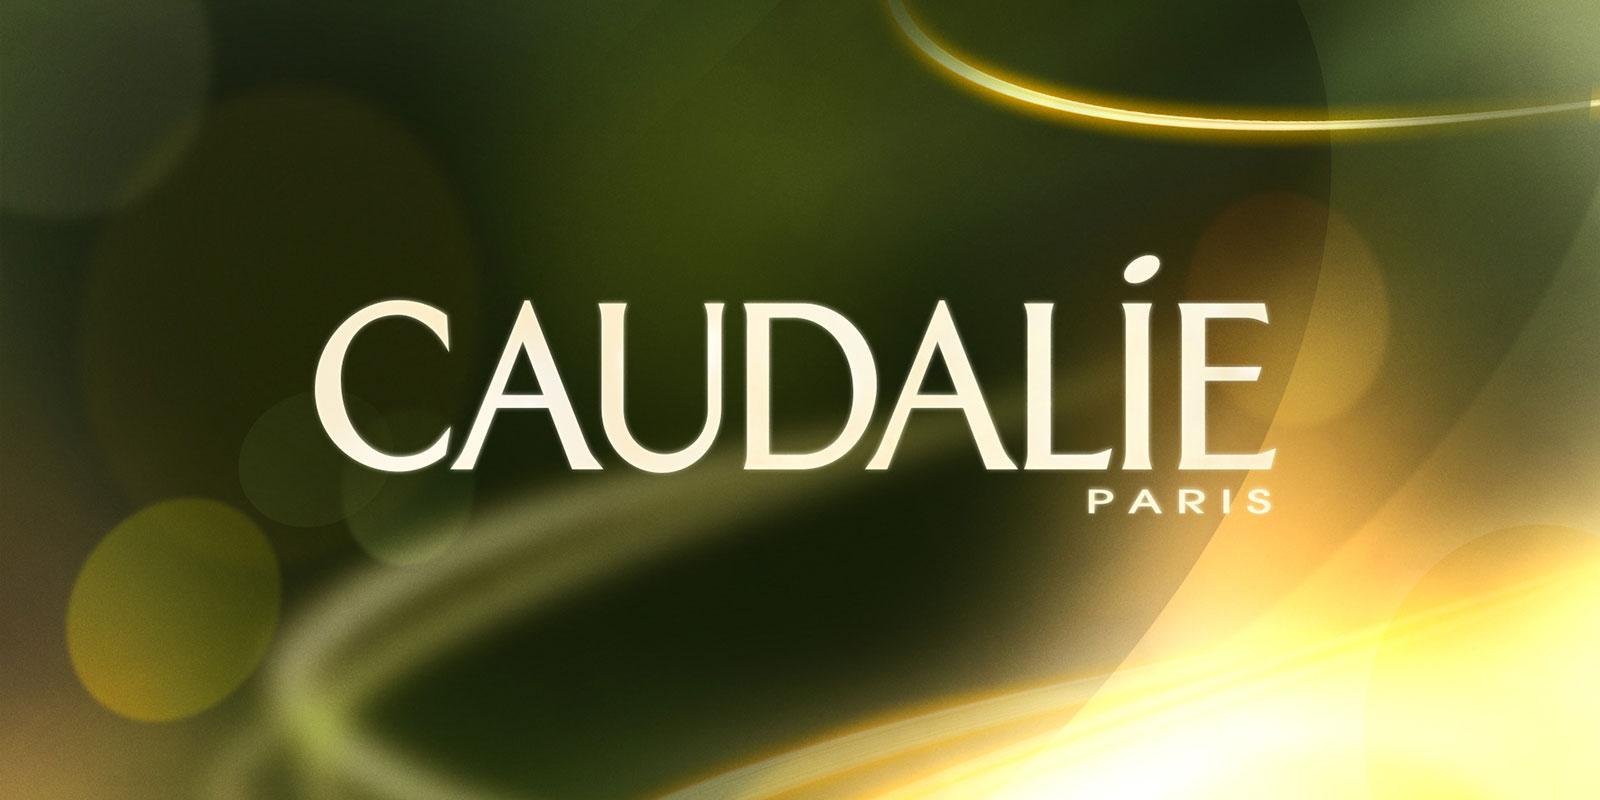 marques-caudalie-furterer-mustela-pharmacie-pk3-cholet